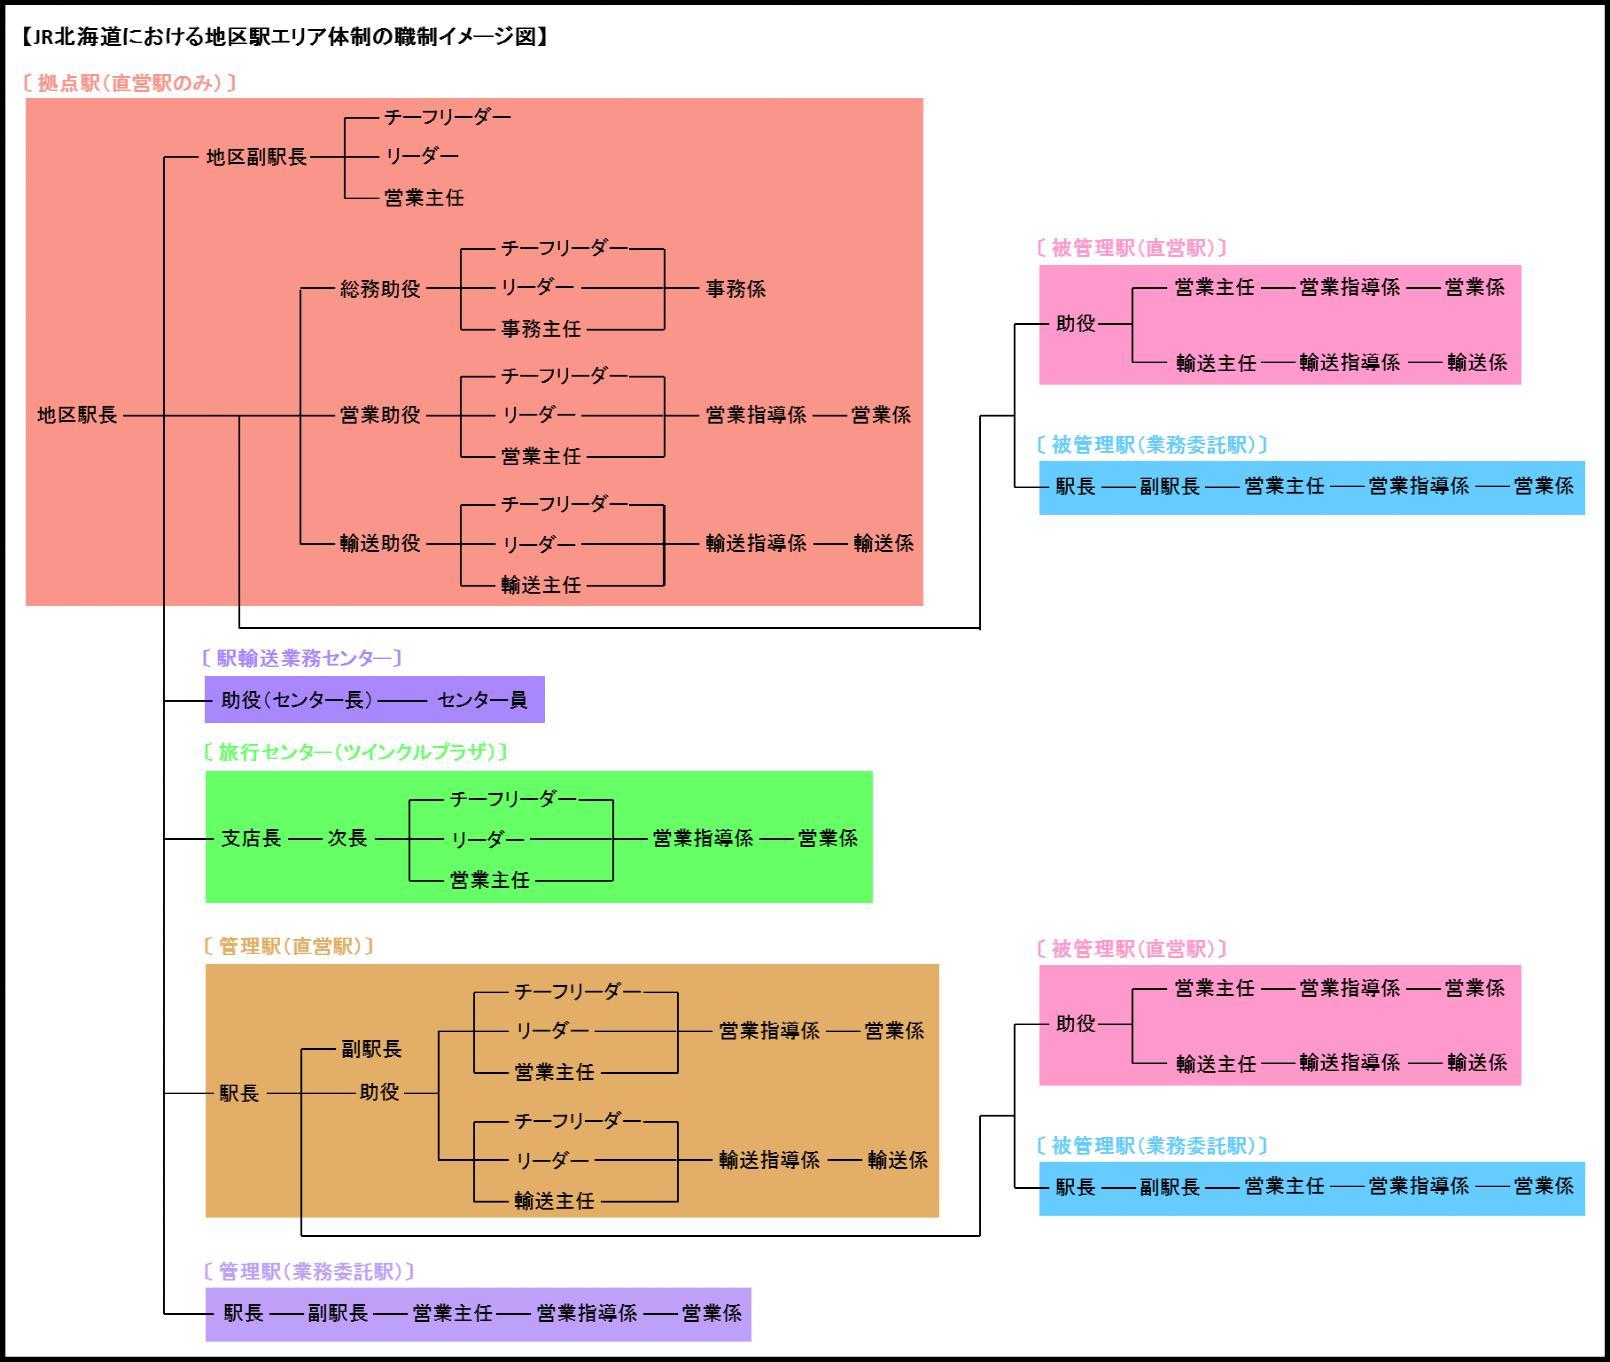 JR北海道の地区駅長制度(職制)